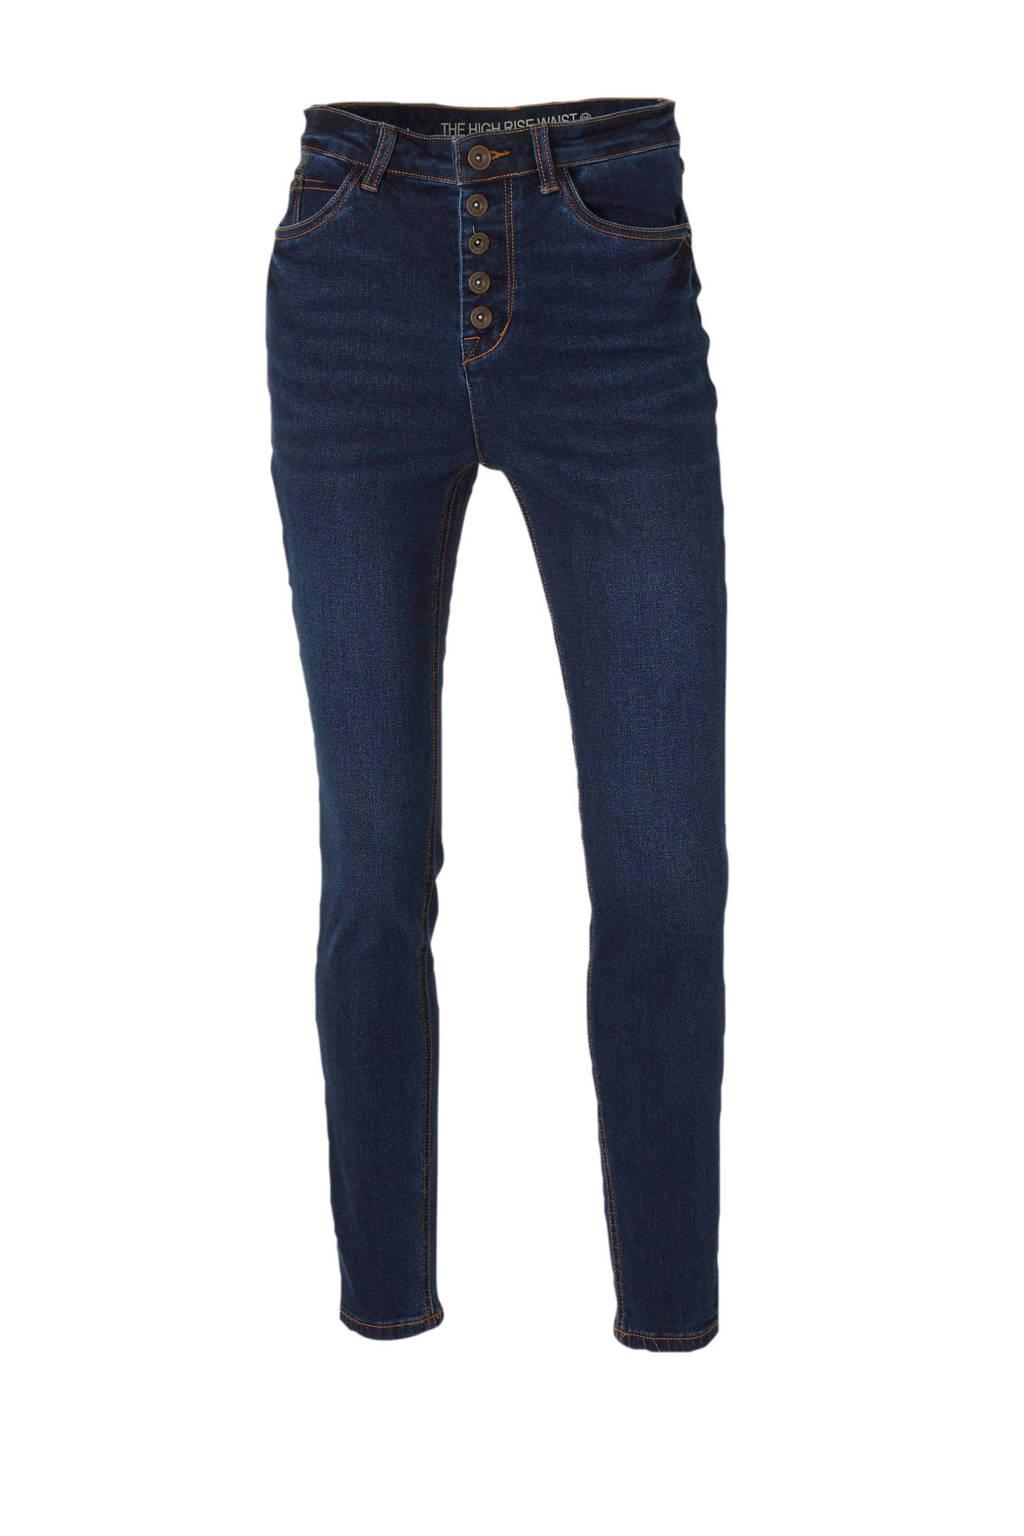 C&A Yessica high waist skinny jeans dark denim, Dark denim